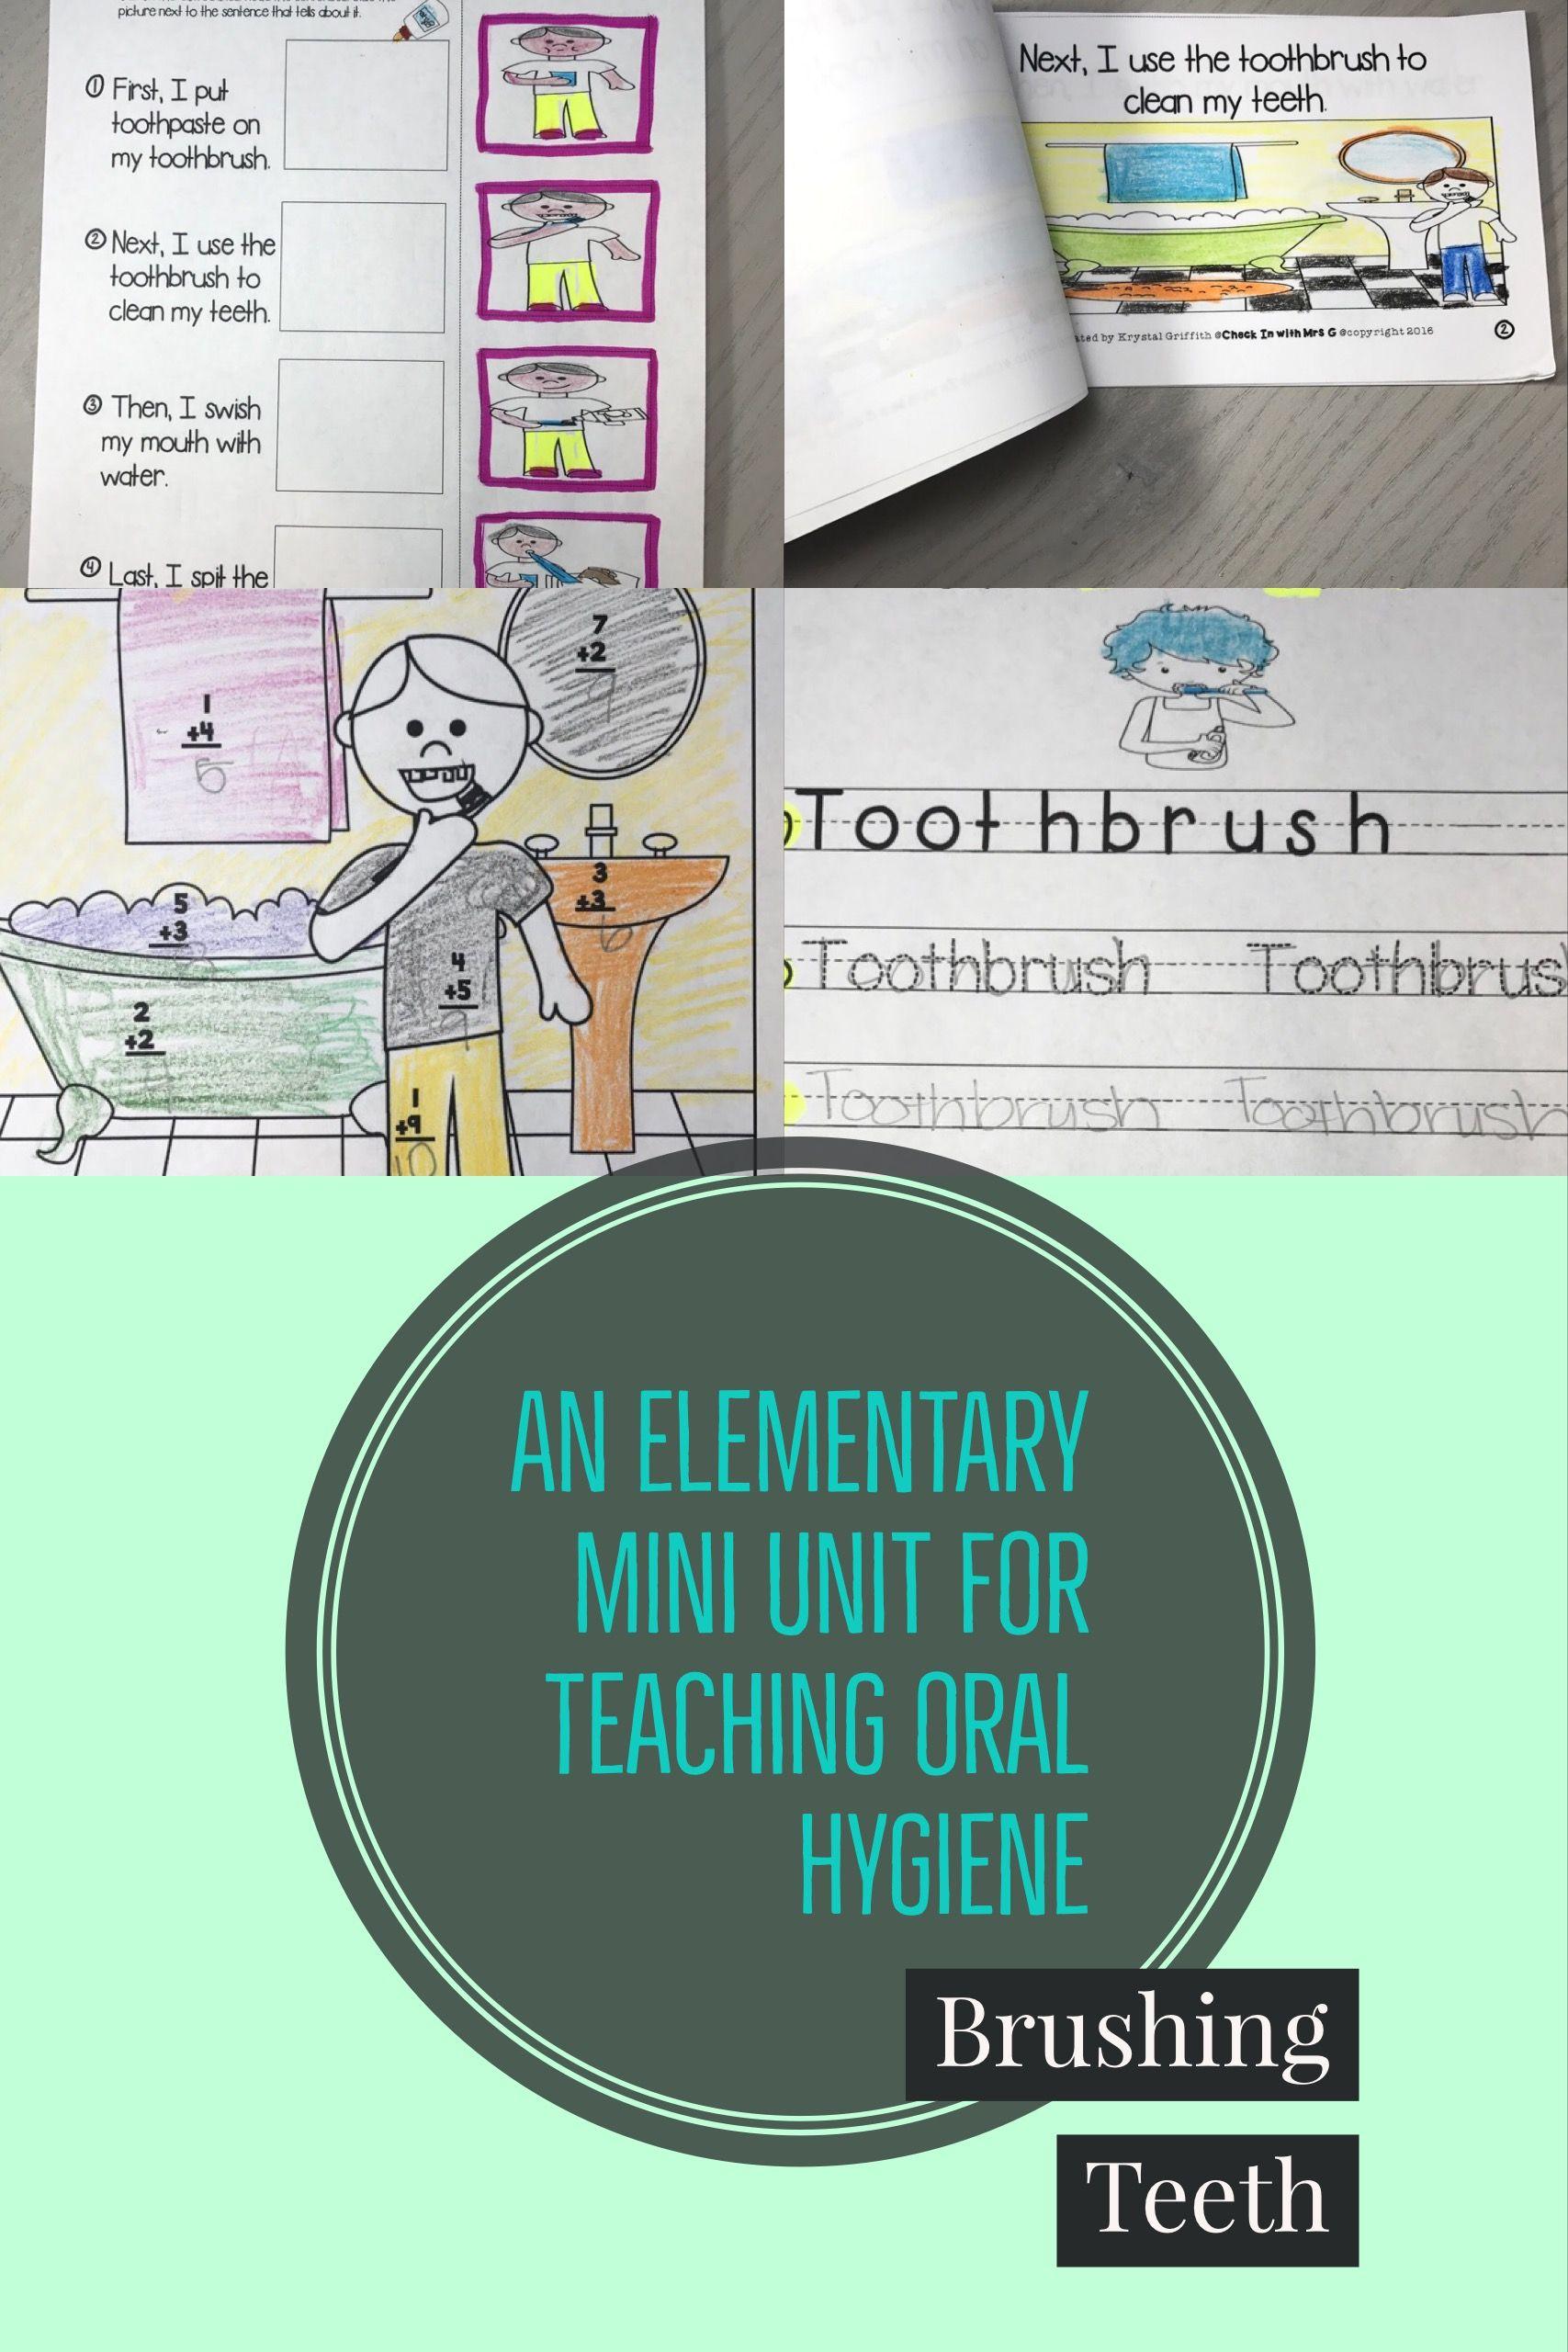 Hygiene Brushing Teeth Mini Unit Including A Social Story